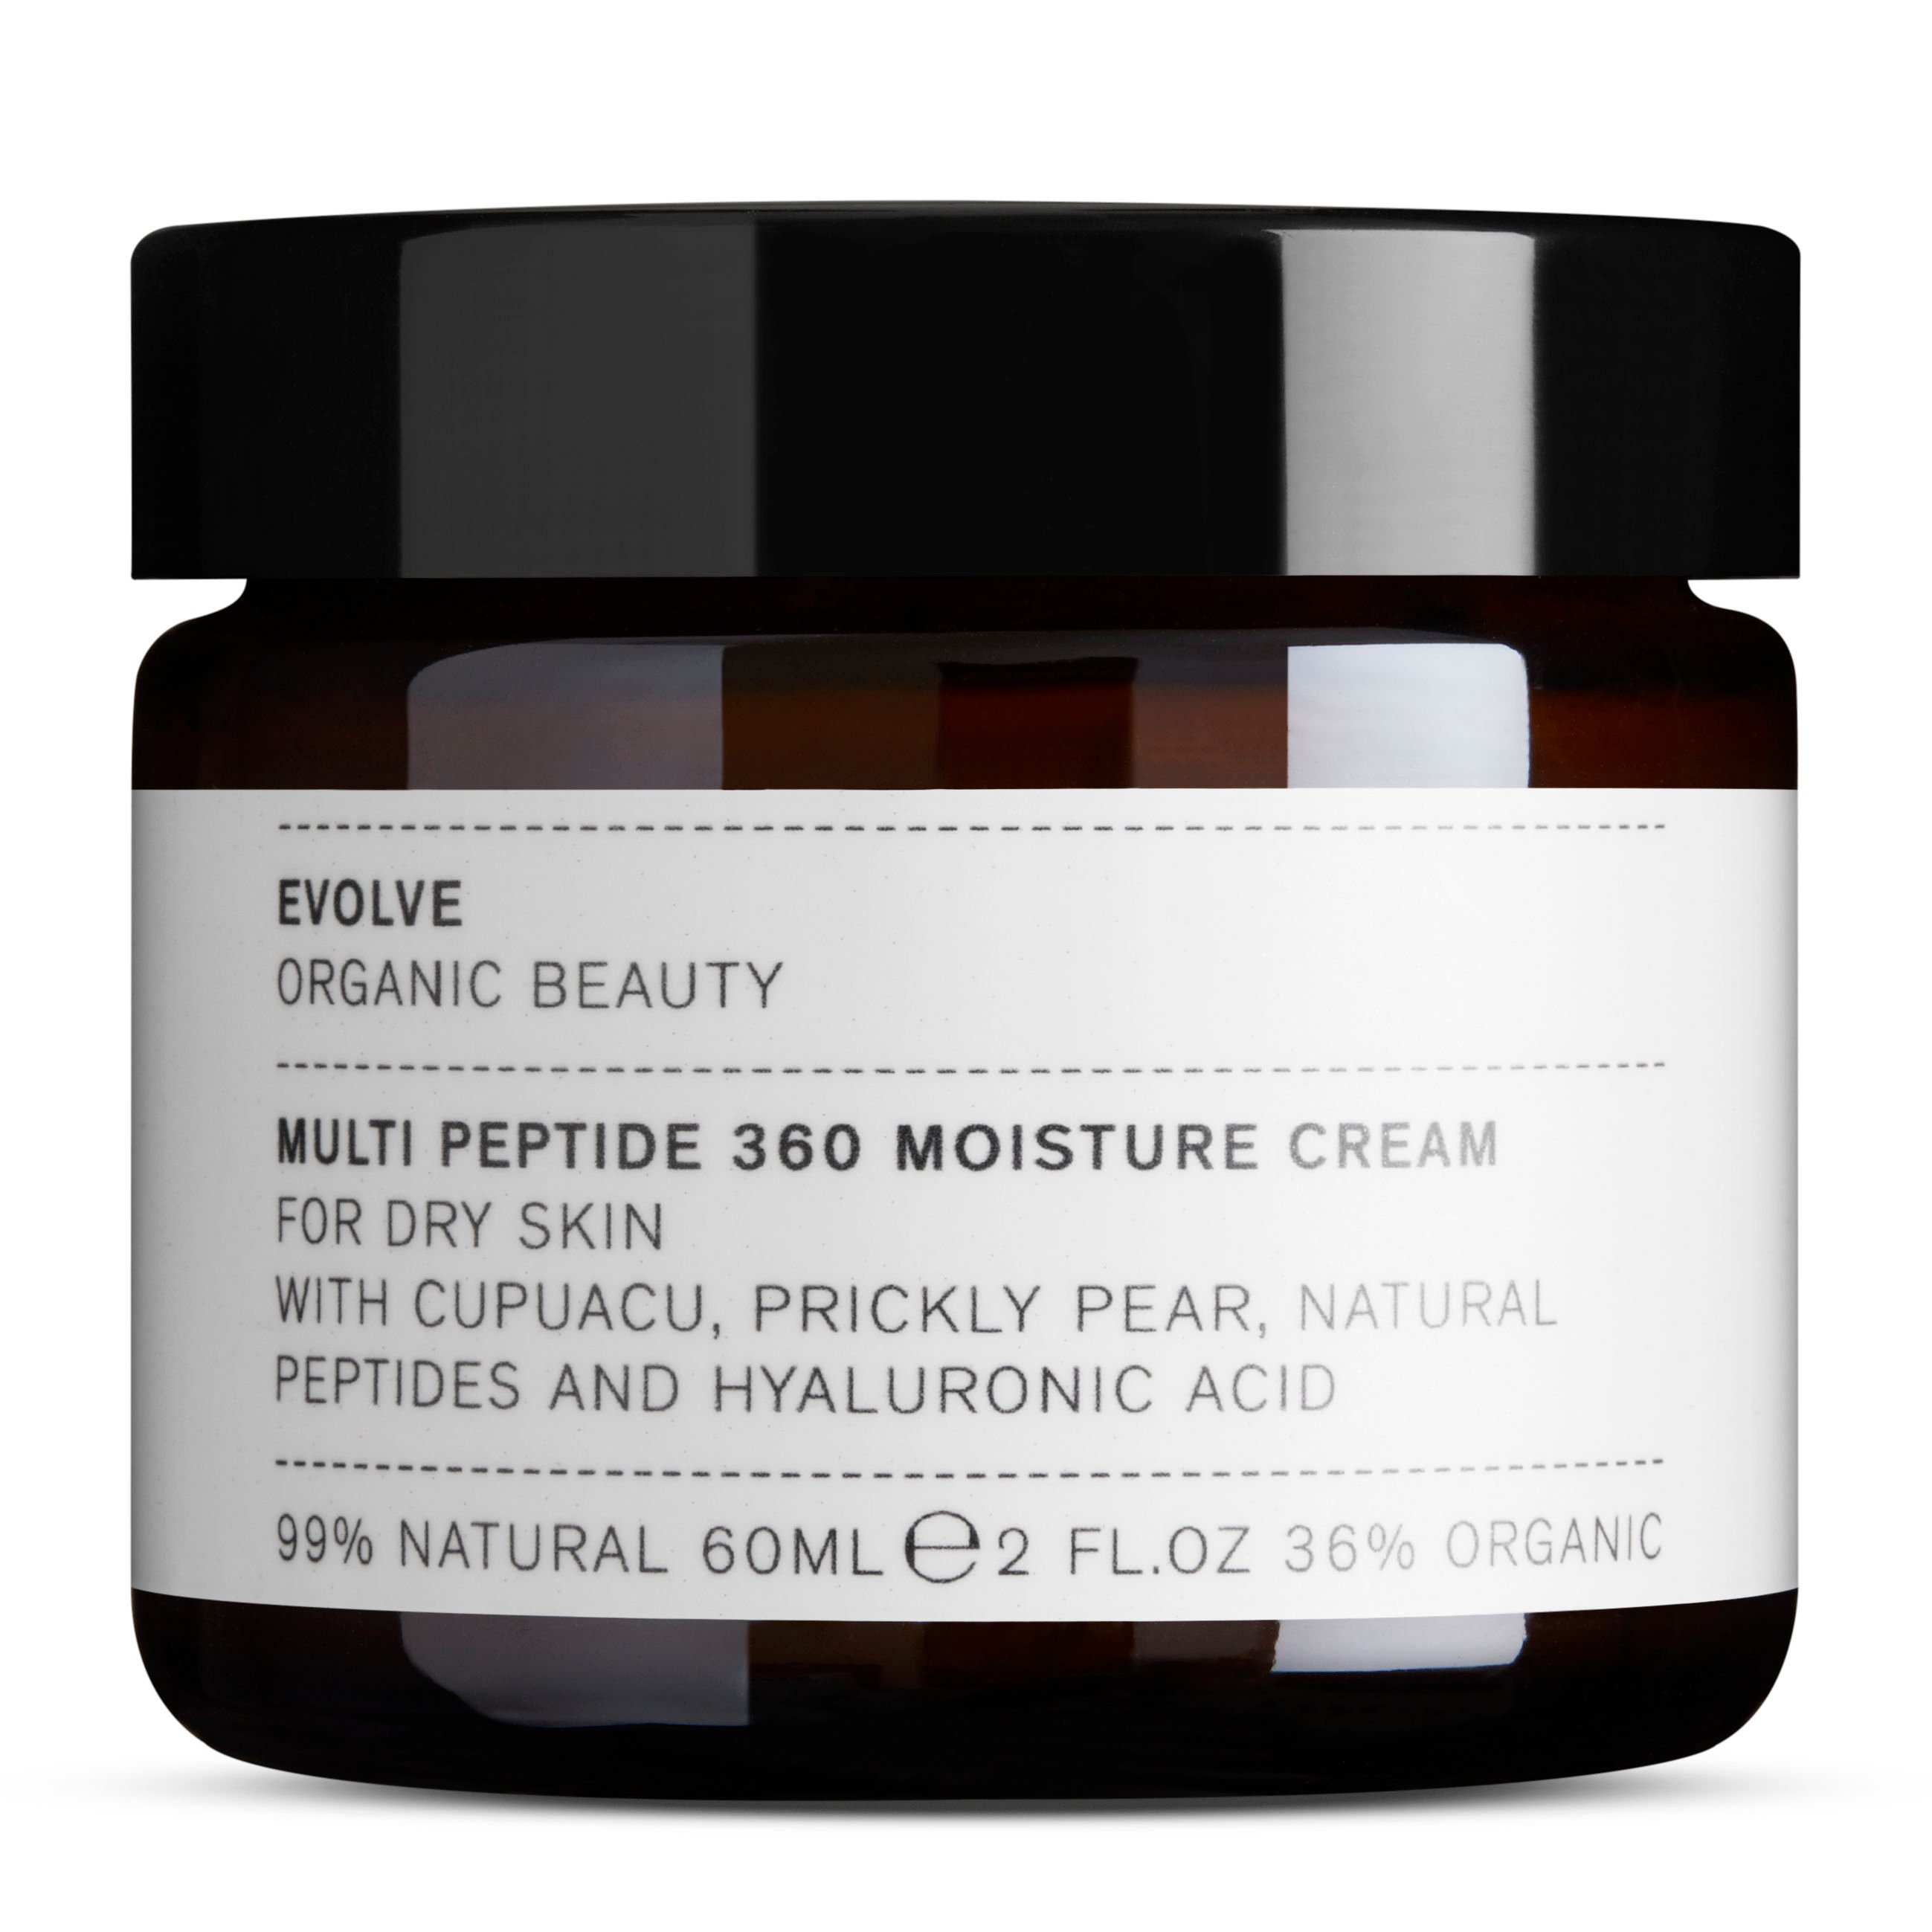 Evolve - Multi Peptide 360 Moisture Cream 60 ml